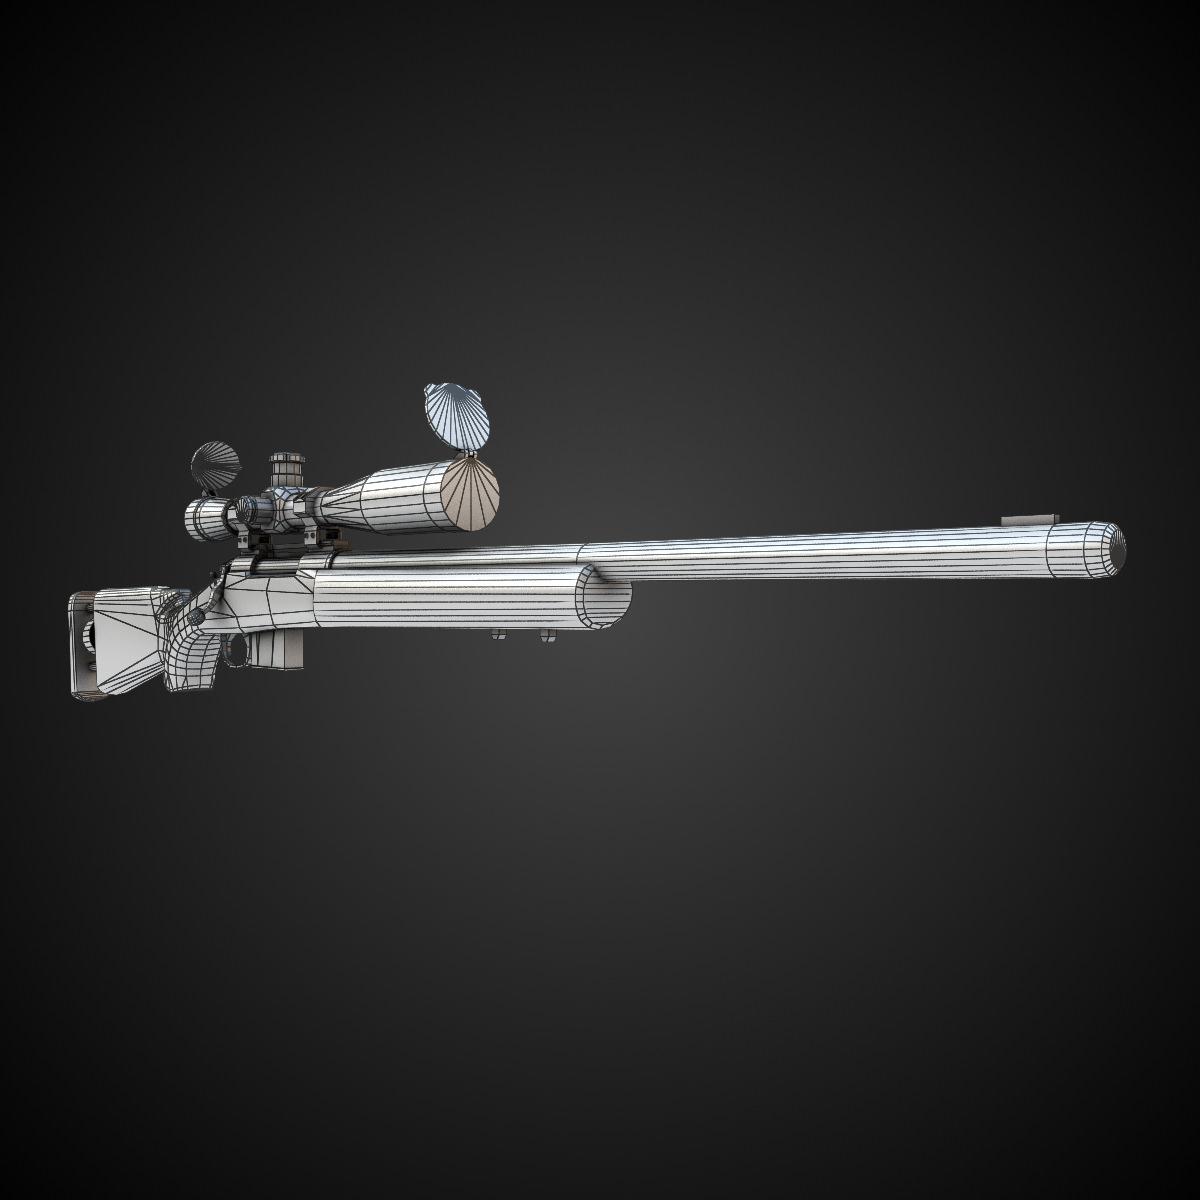 m24a2 sniper rifle - photo #34